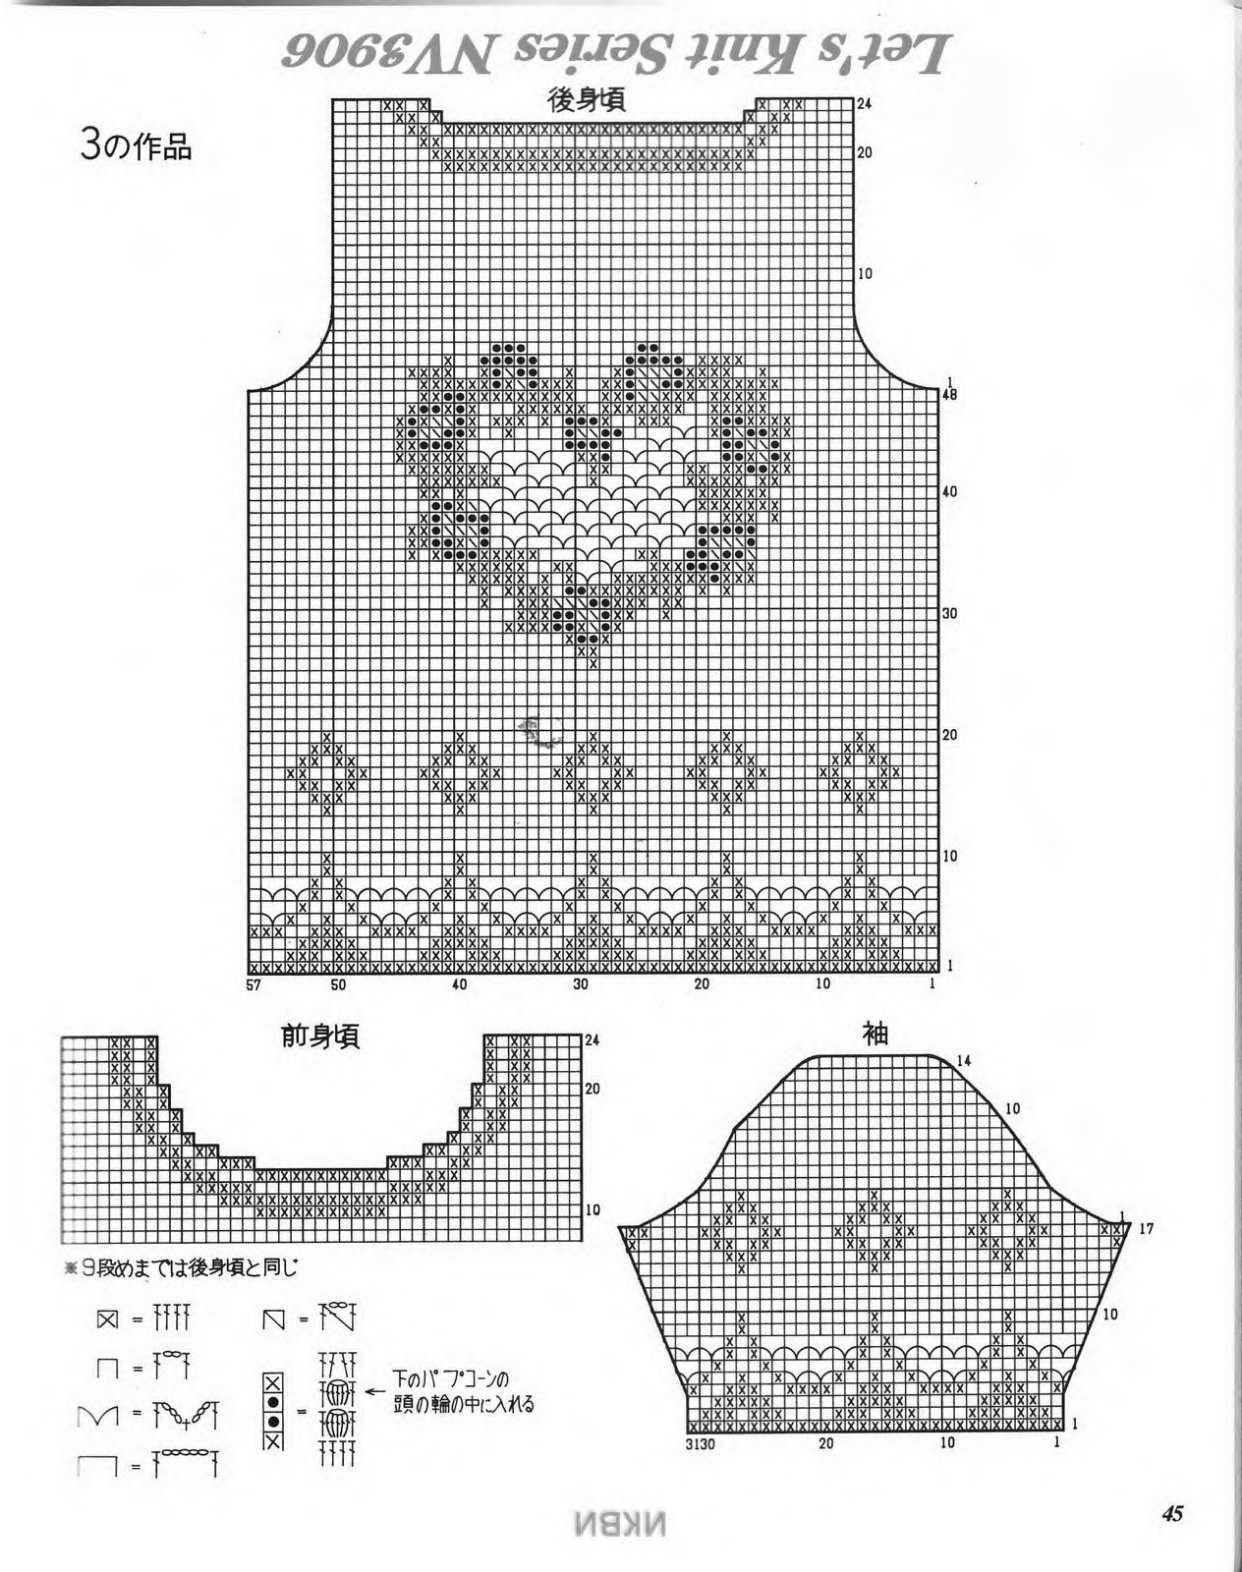 filet crochet top pattern | Blusas crochet con patron | Pinterest ...